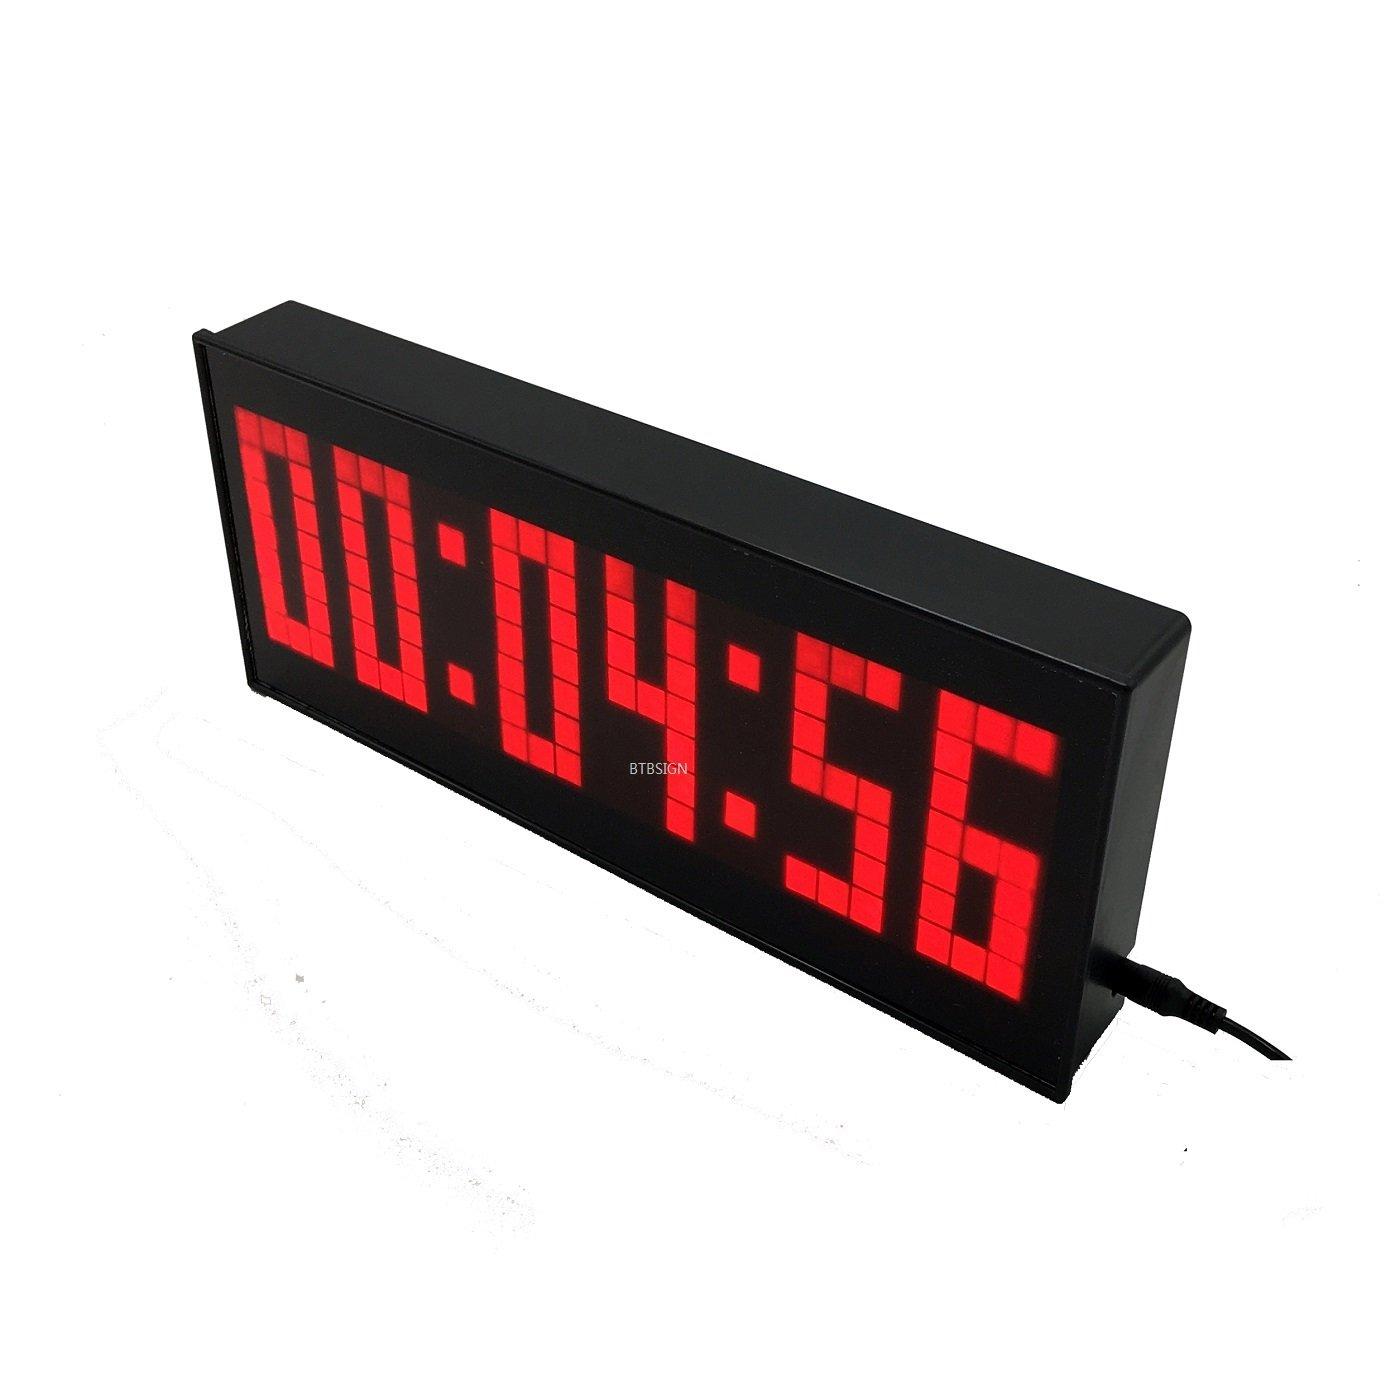 Btbsign Bt Led Digital Countdown Wall Clock With Remote